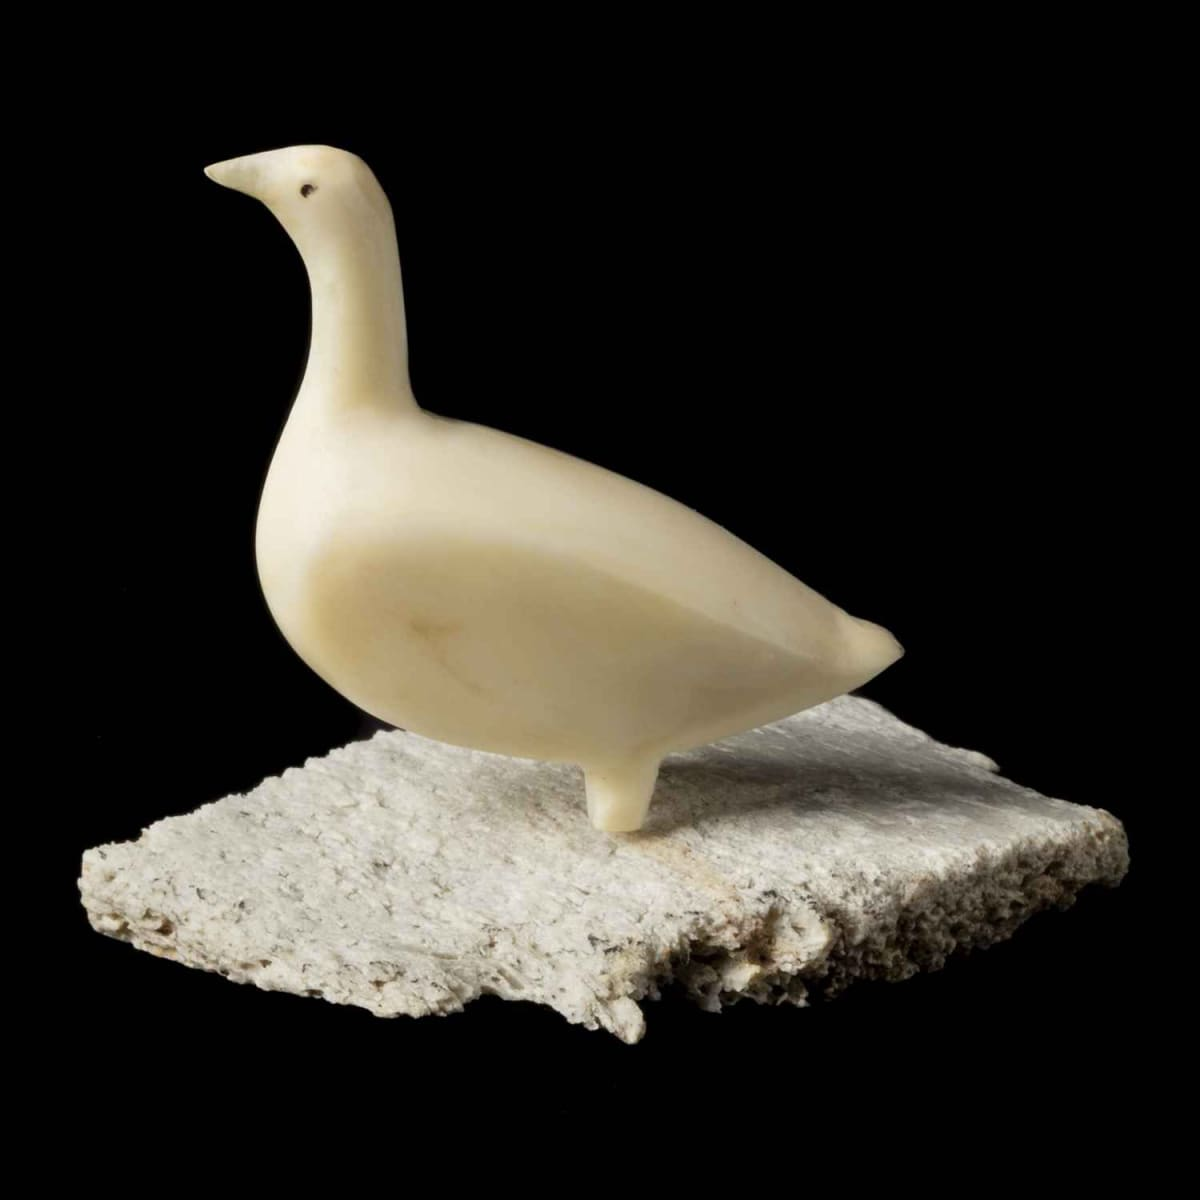 34. UNIDENTIFIED ARTIST, KUGAARUK (PELLY BAY) Standing Bird, 1971